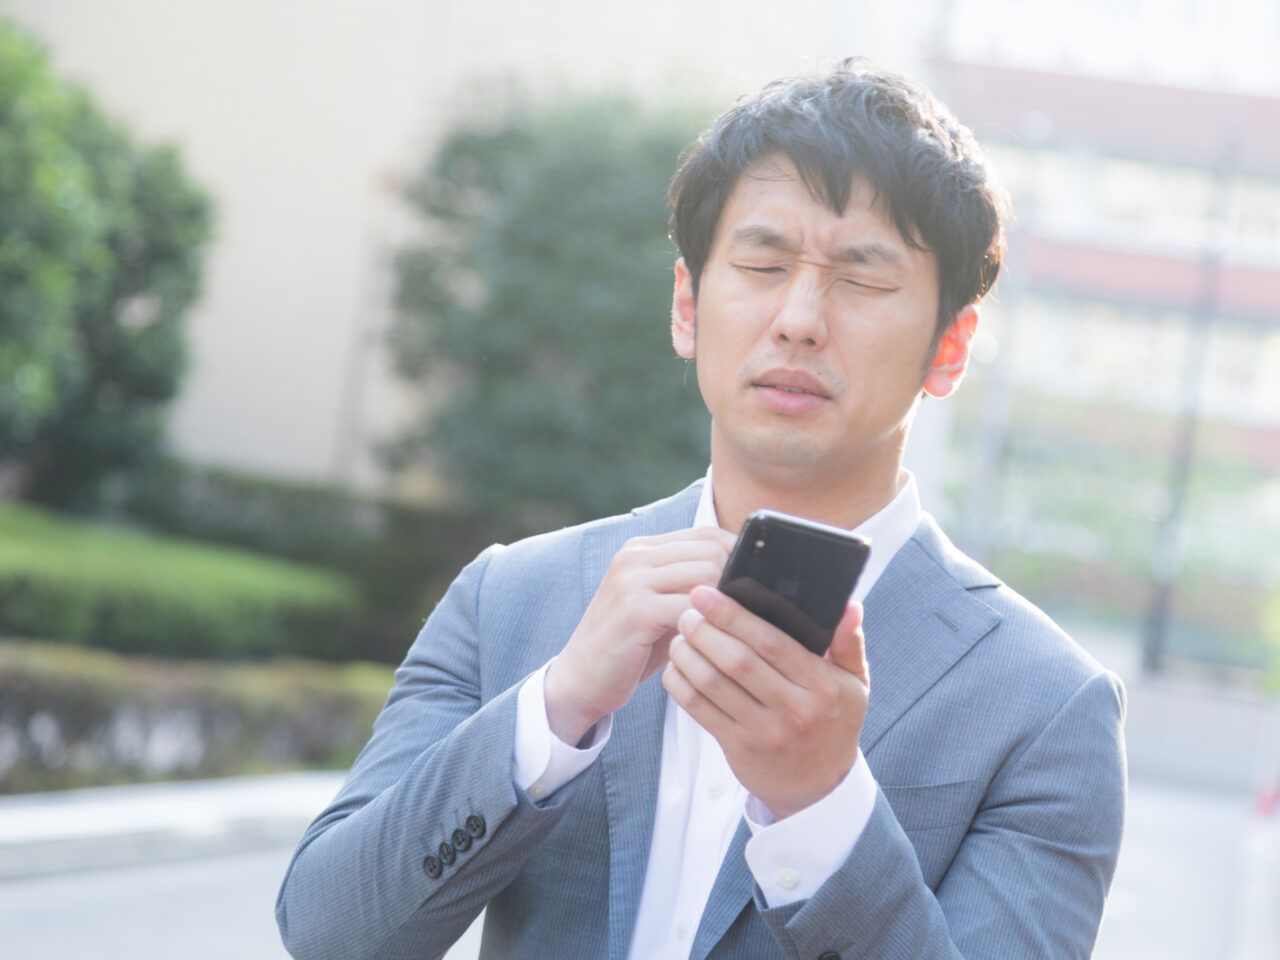 iPhoneのiCloudメールに料金はかかる?送受信や基本料金などはある?のサムネイル画像